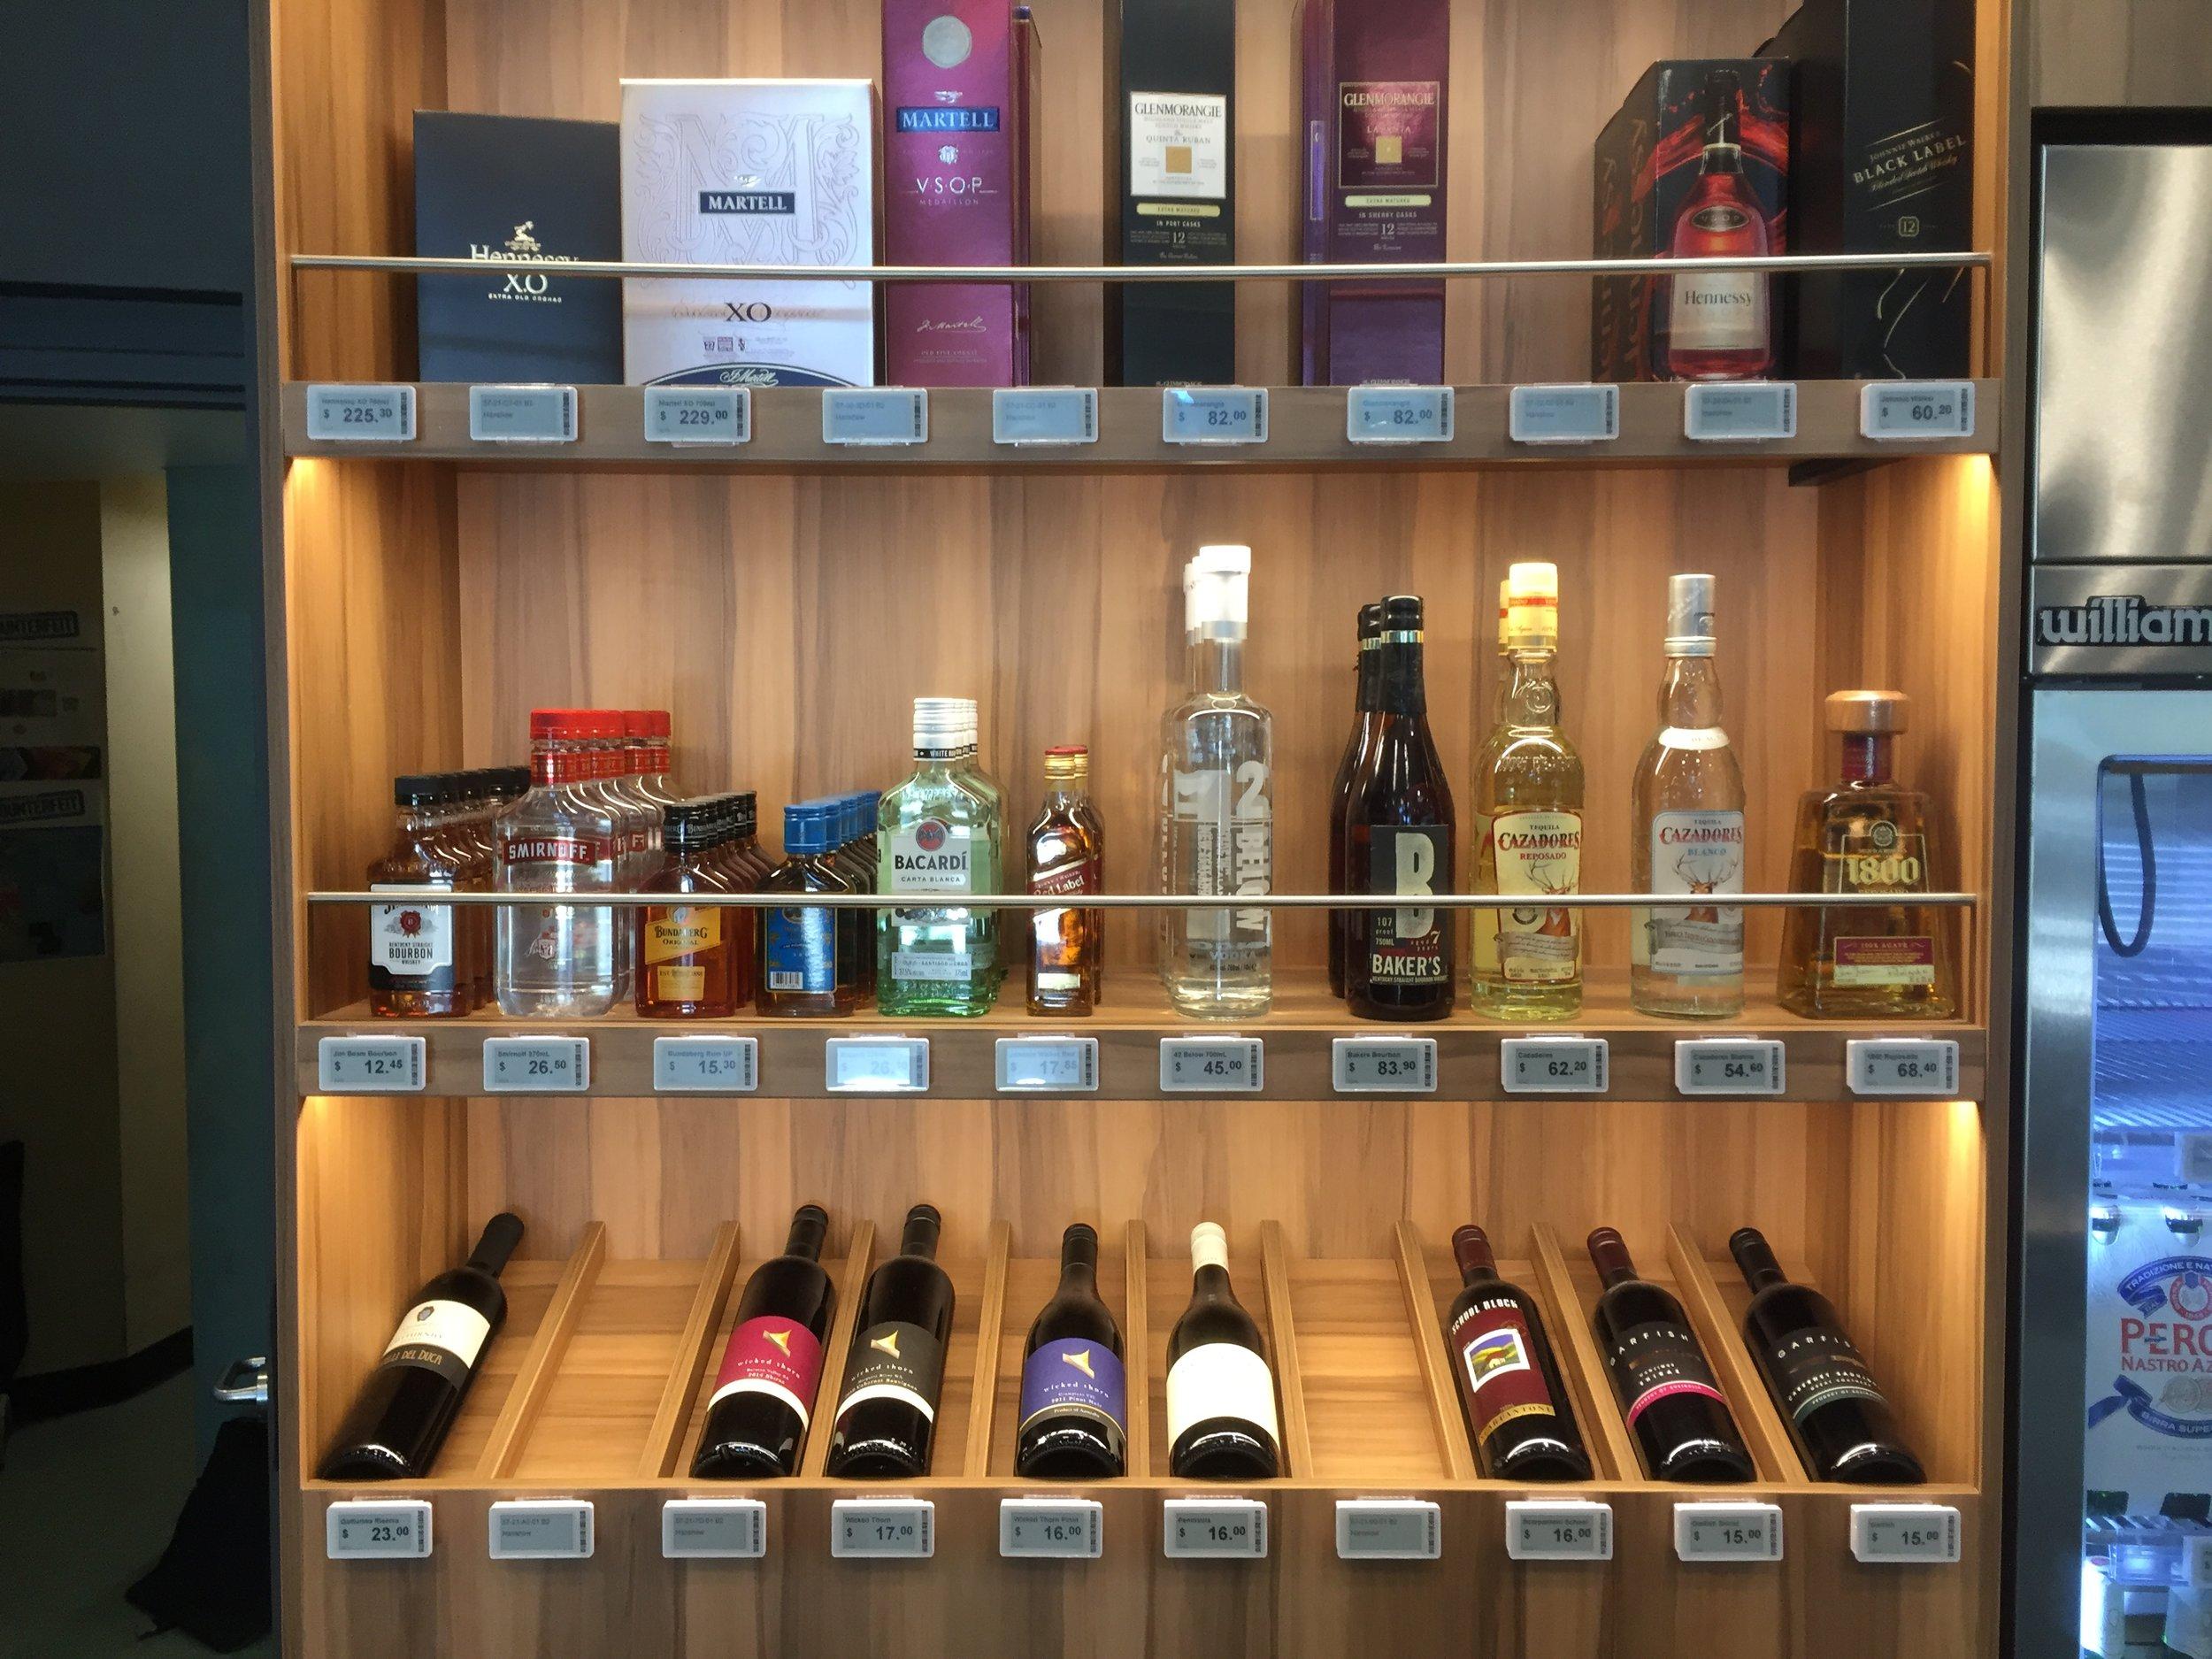 Sydney bottle shop liquor display with ESLs